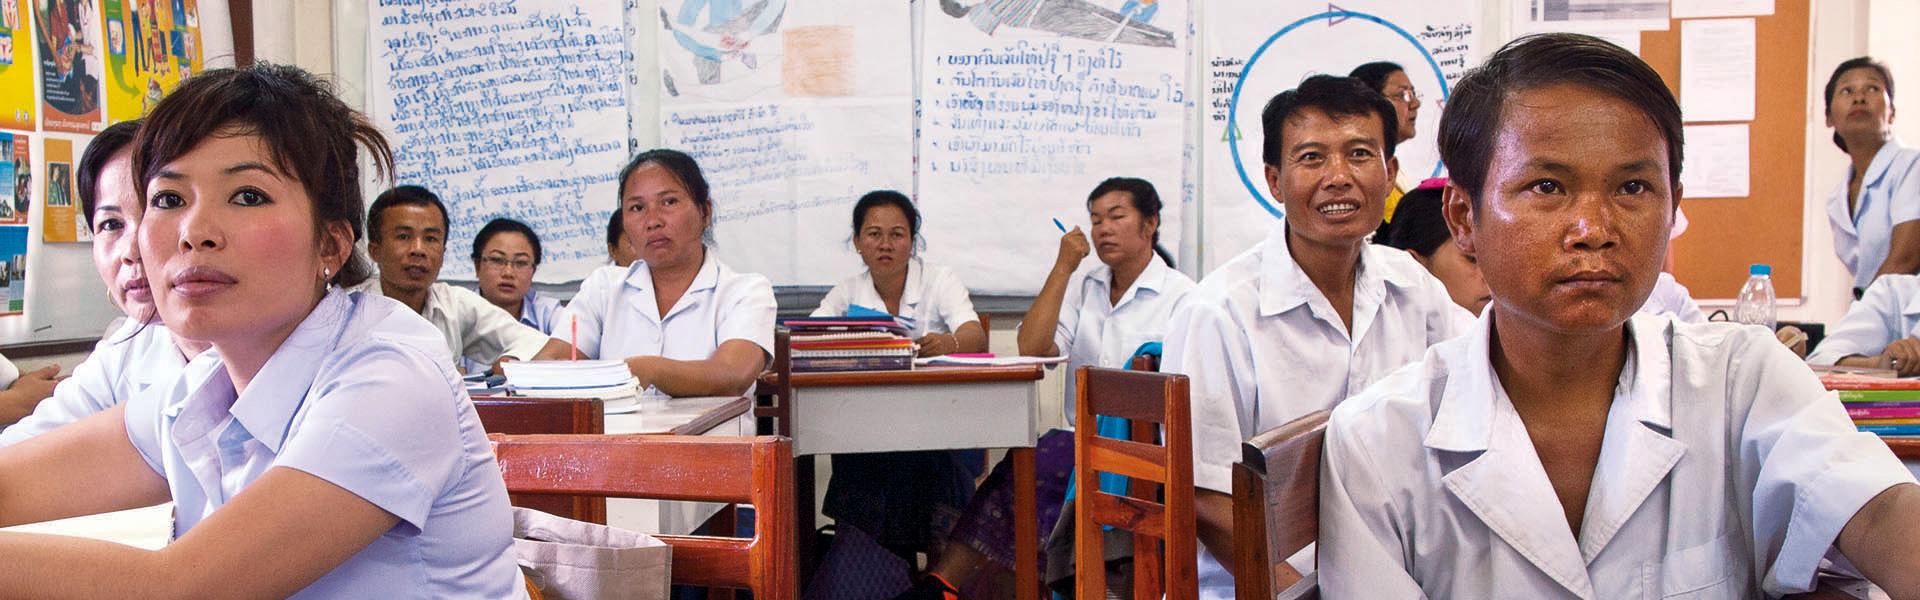 Health Education in Laos